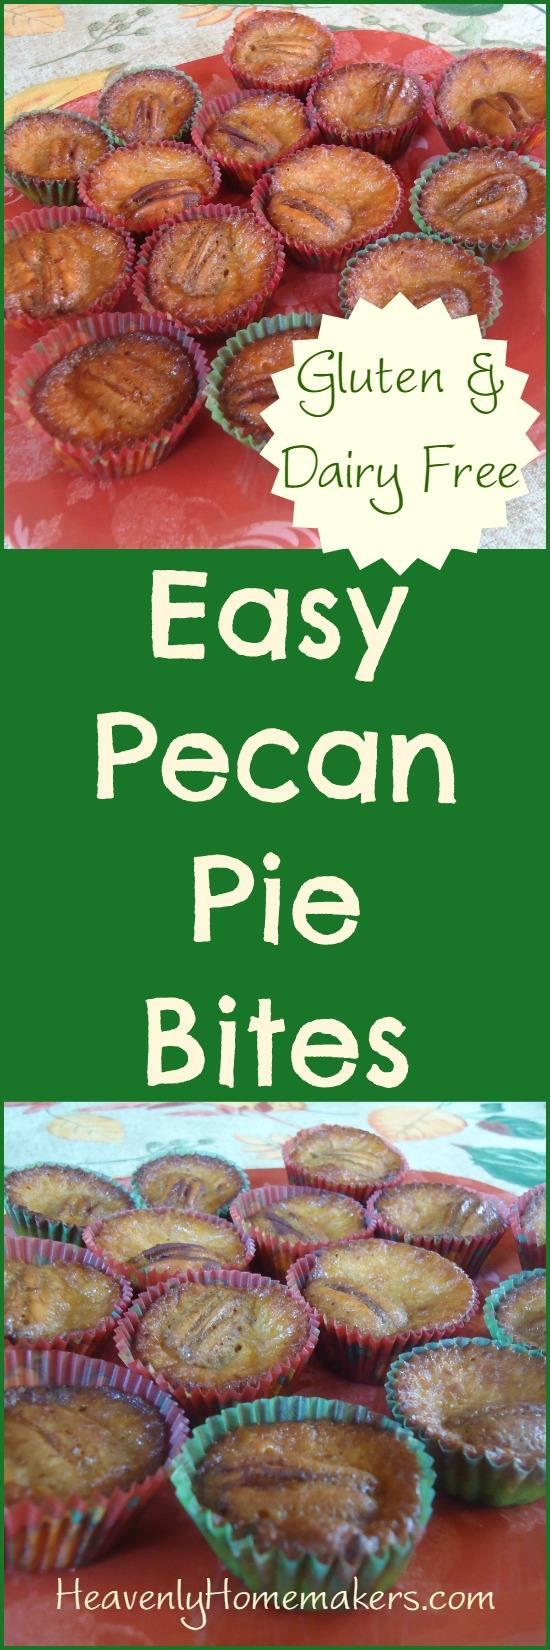 Easy Pecan Pie Bites ~ Naturally Gluten and Dairy Free